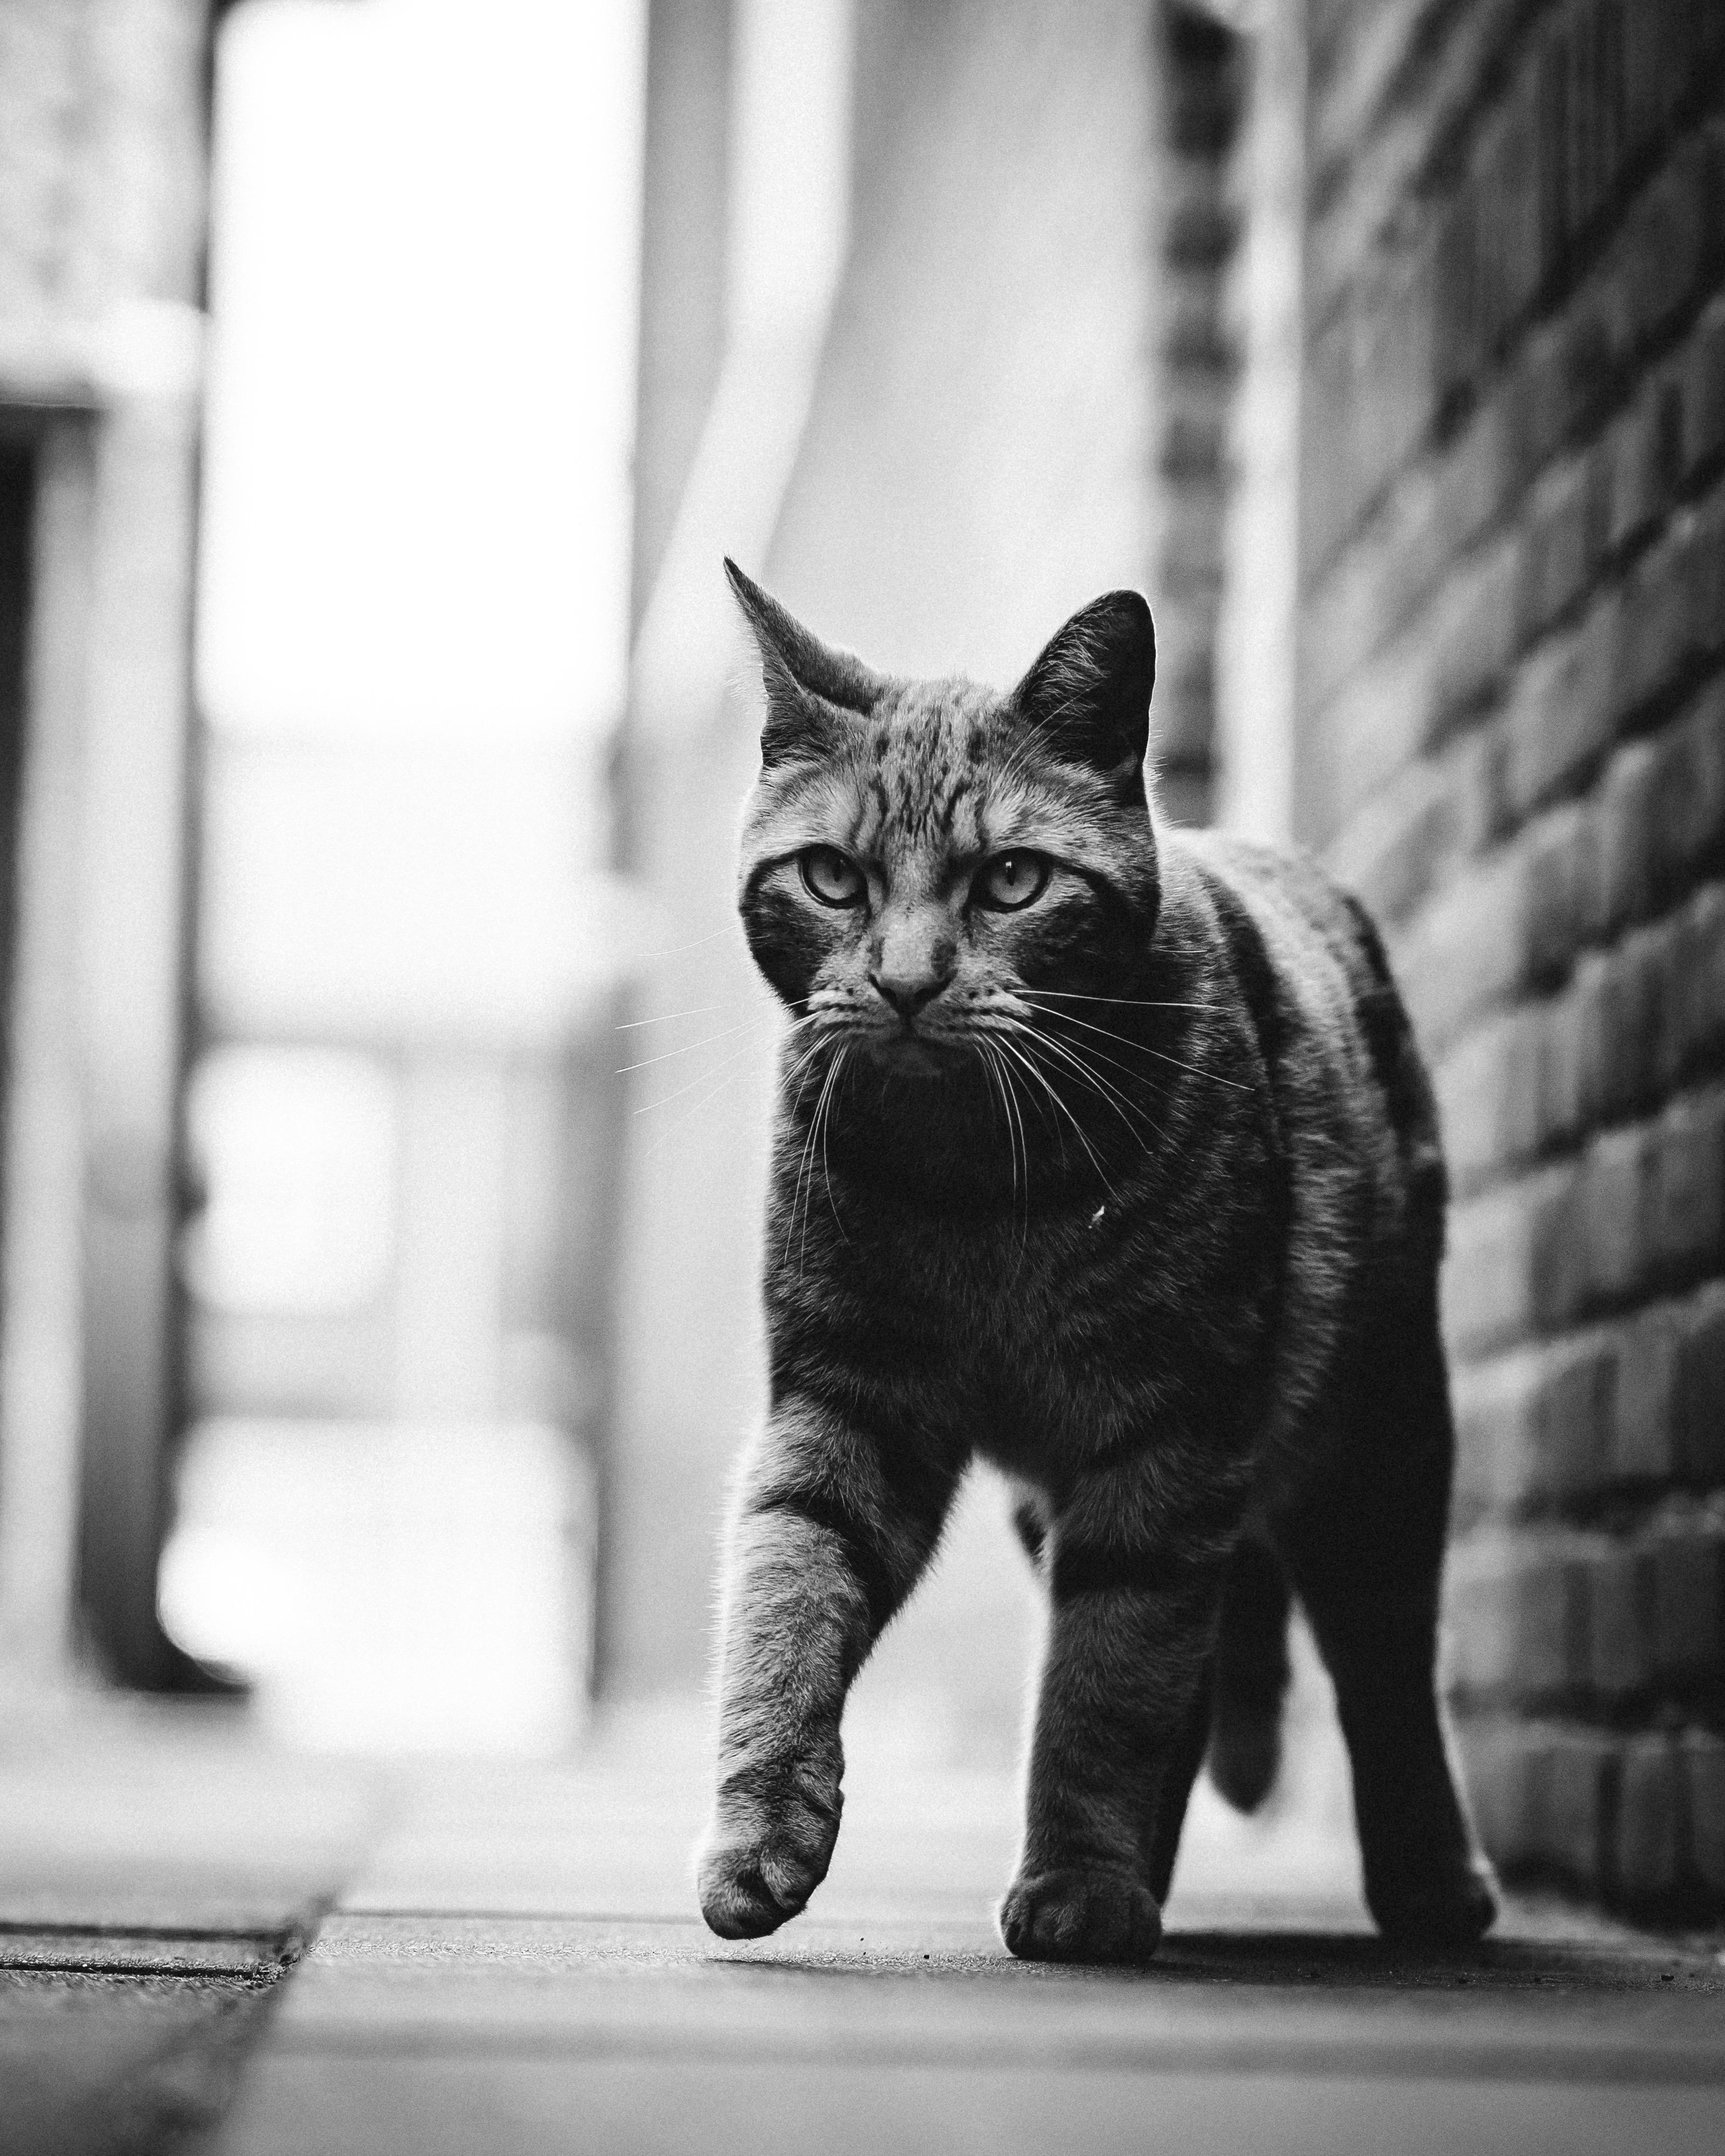 Monochrome Photo of Tabby Cat